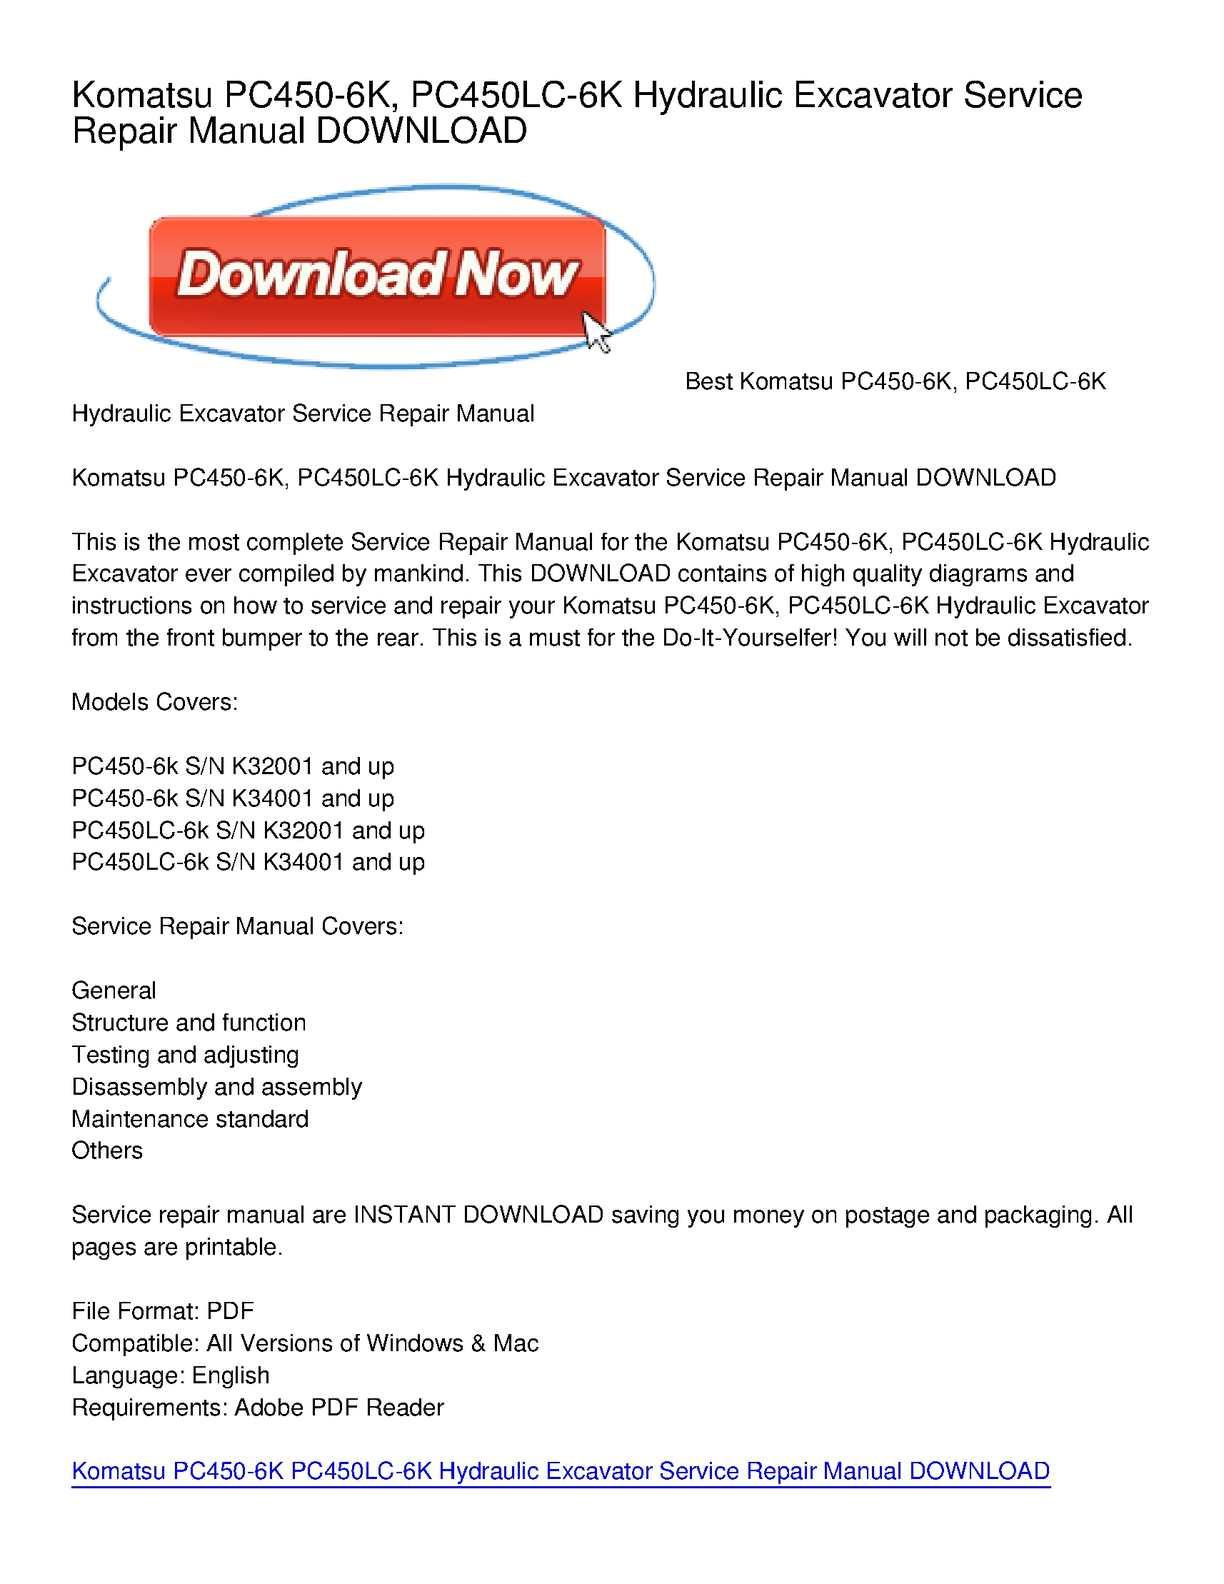 Calaméo - Komatsu PC450-6K, PC450LC-6K Hydraulic Excavator Service Repair  Manual DOWNLOAD